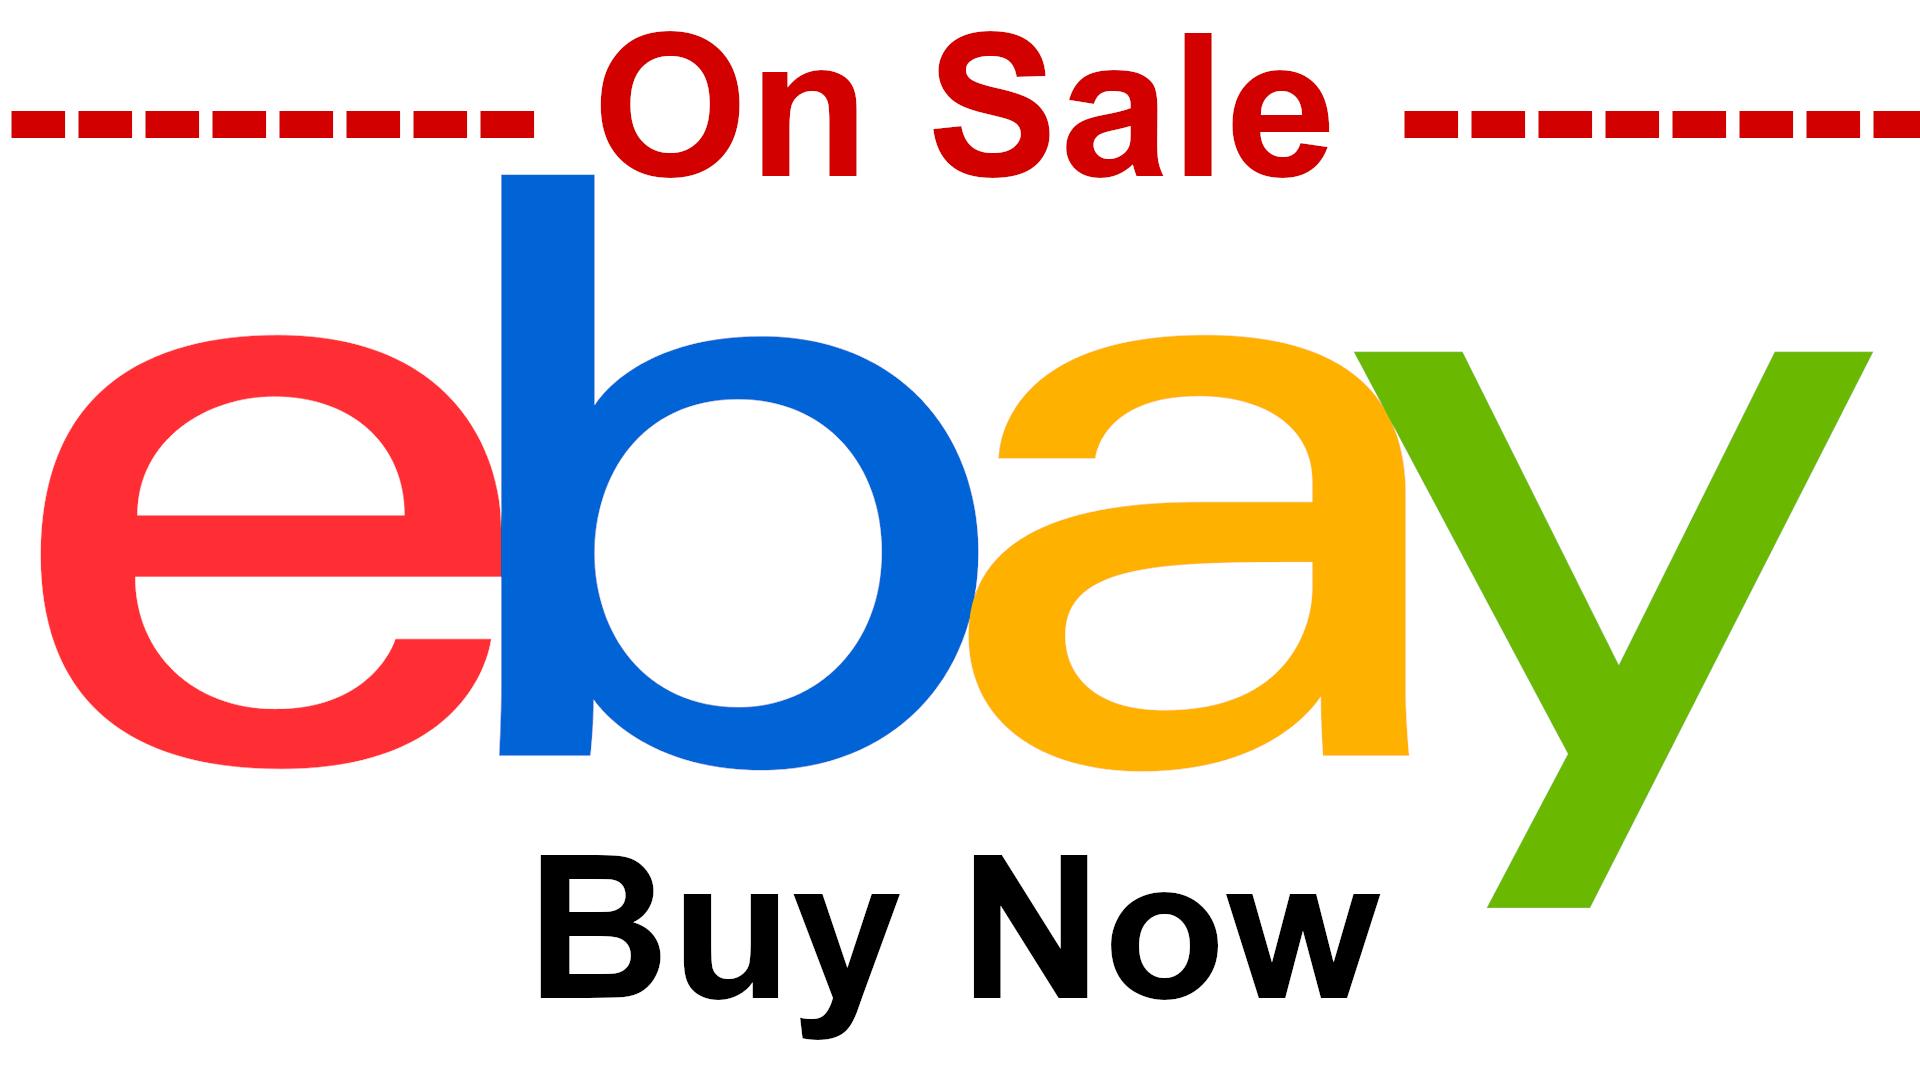 Ebay Logo buy now on sale